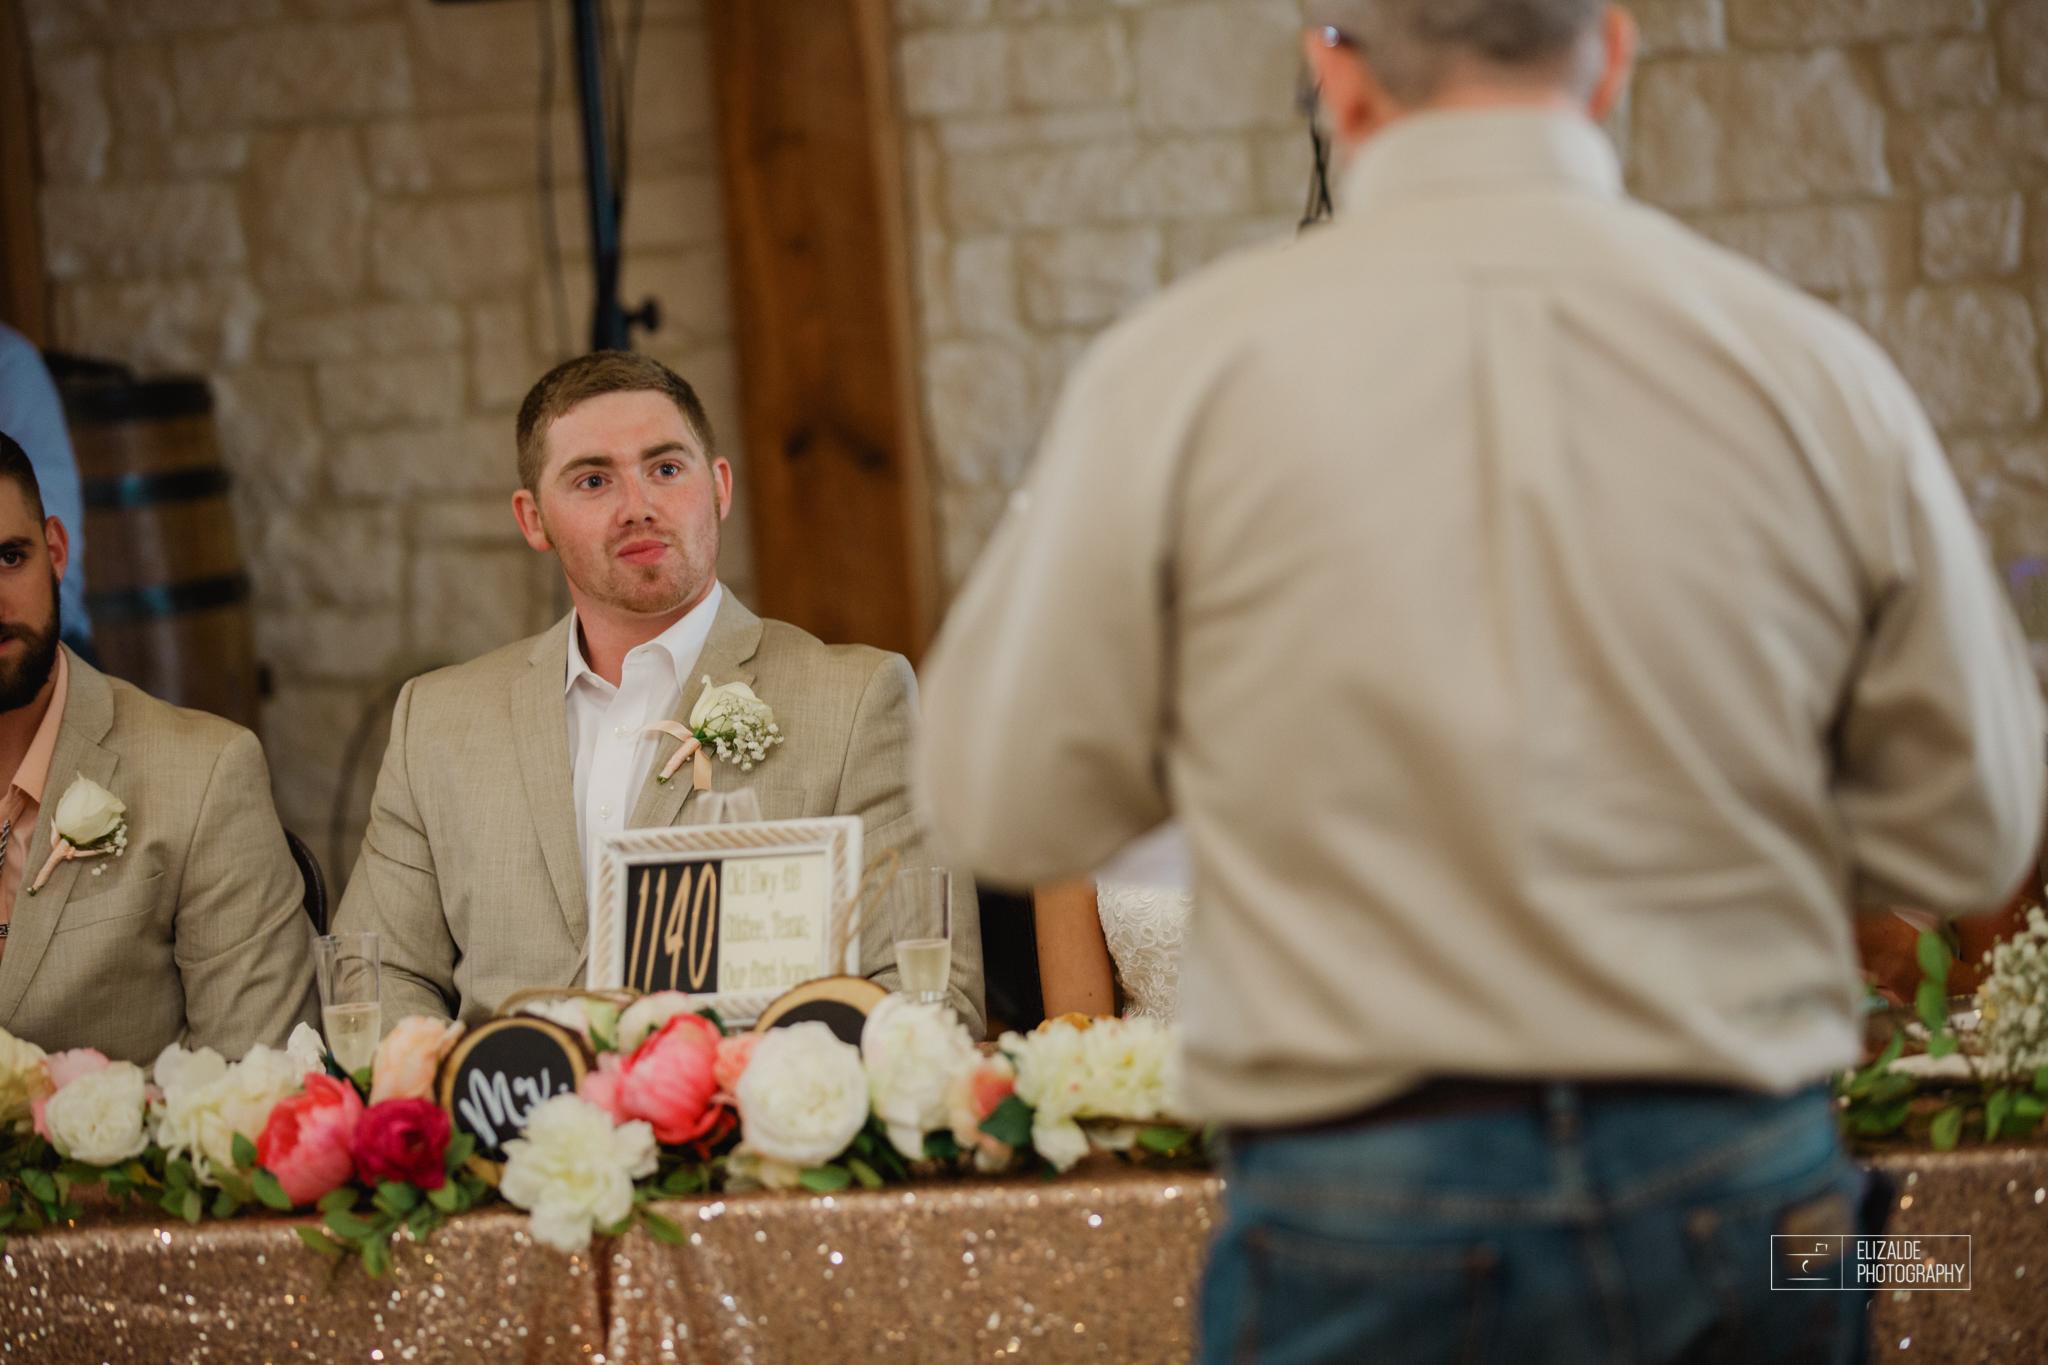 Wedding photographer Dallas_Elizalde Photography_DFW Wedding photographer_ Hickoty Hills_Wedding Photography (75 of 90).jpg